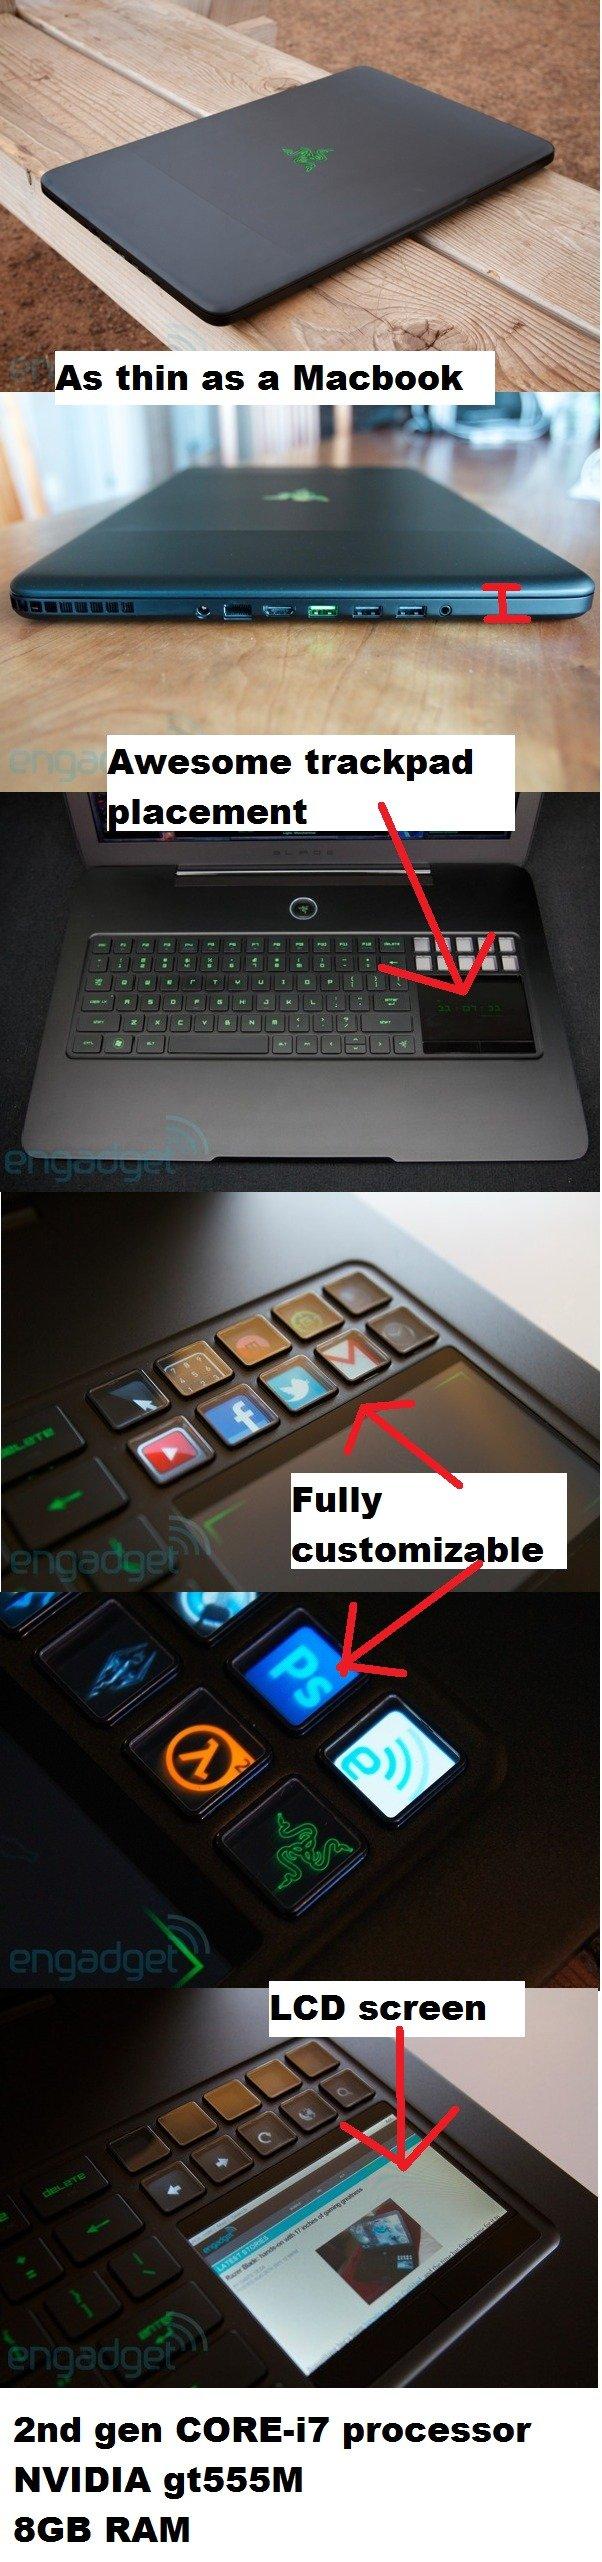 Razer Blade laptop. DO WANT. www.engadget.com/2012/02/22/razer-blade-review/. I bl I tiill . k psi?, thin . 2, an Macabo basement LCD screen gnd [,ilgili: proce